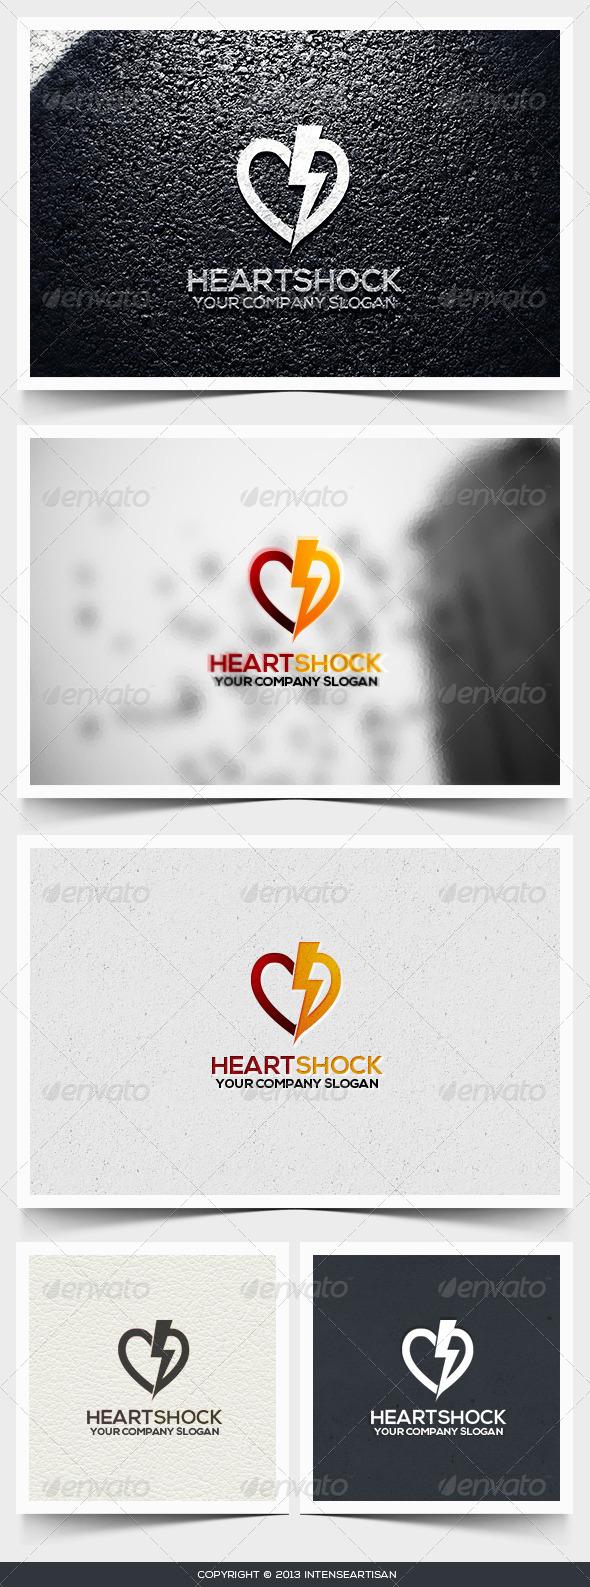 Heart Shock Logo Template - Objects Logo Templates